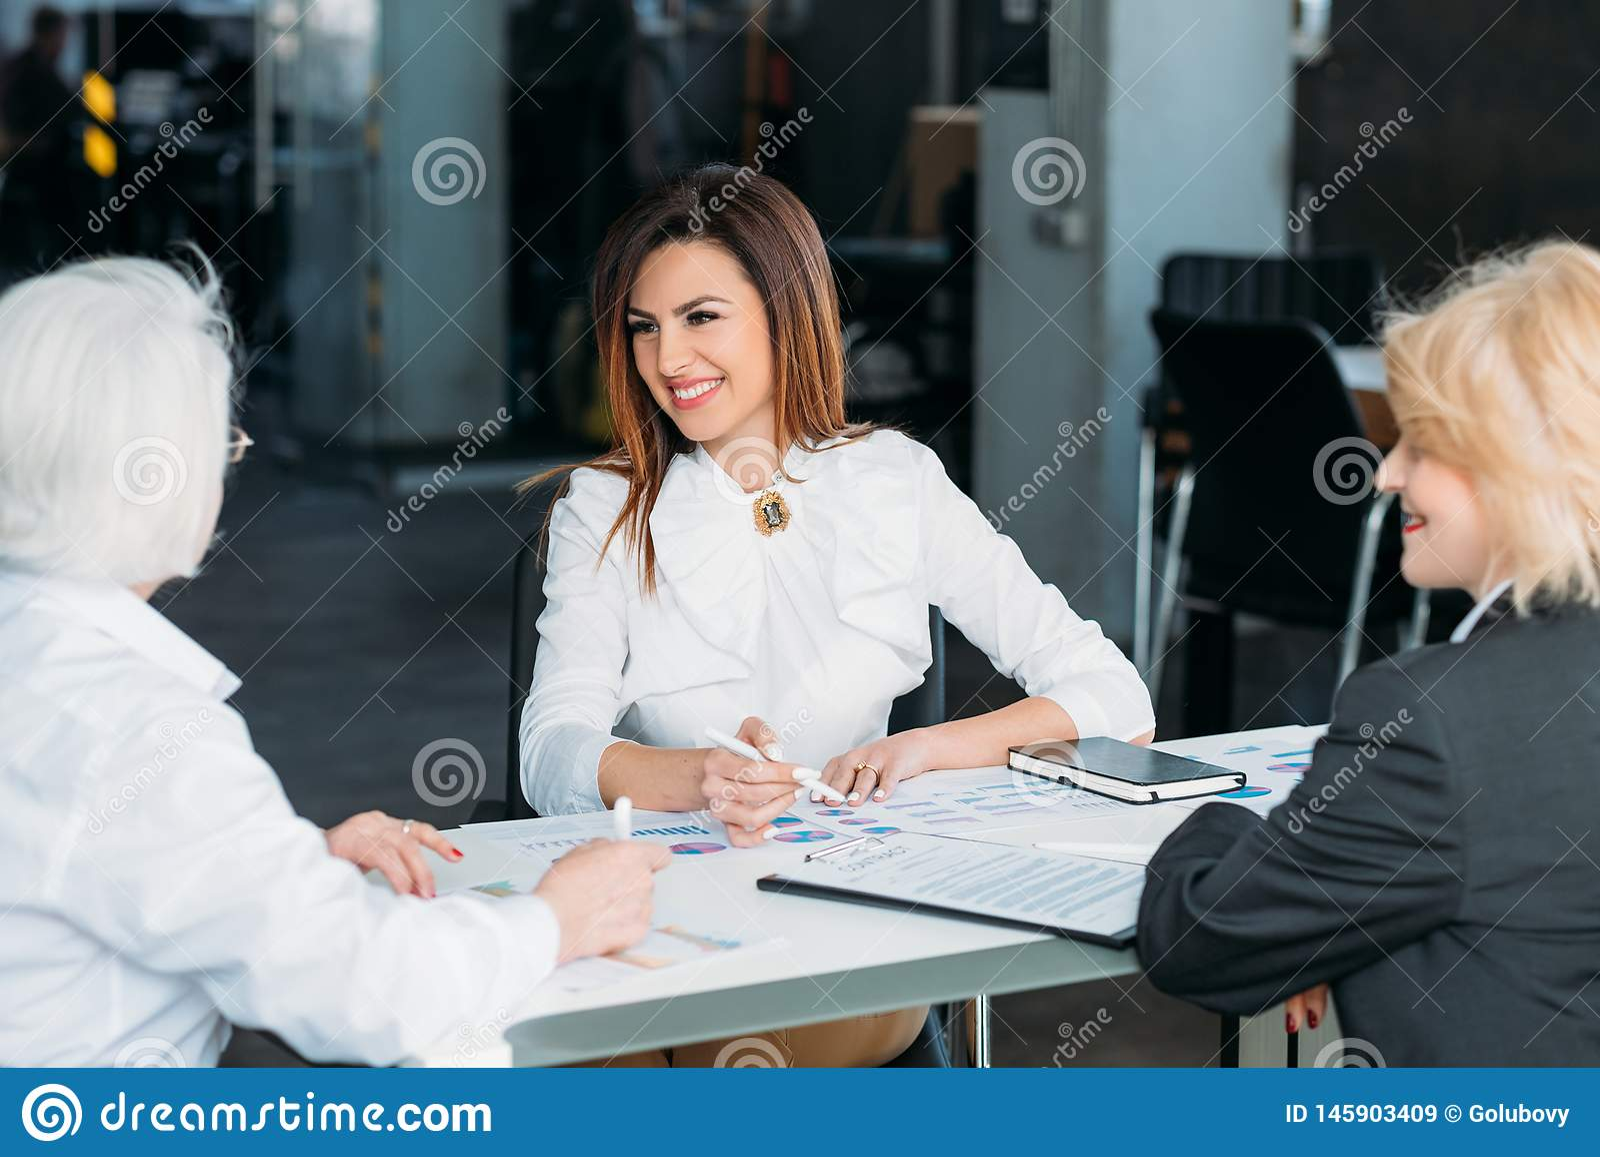 Professional partnership successful business women